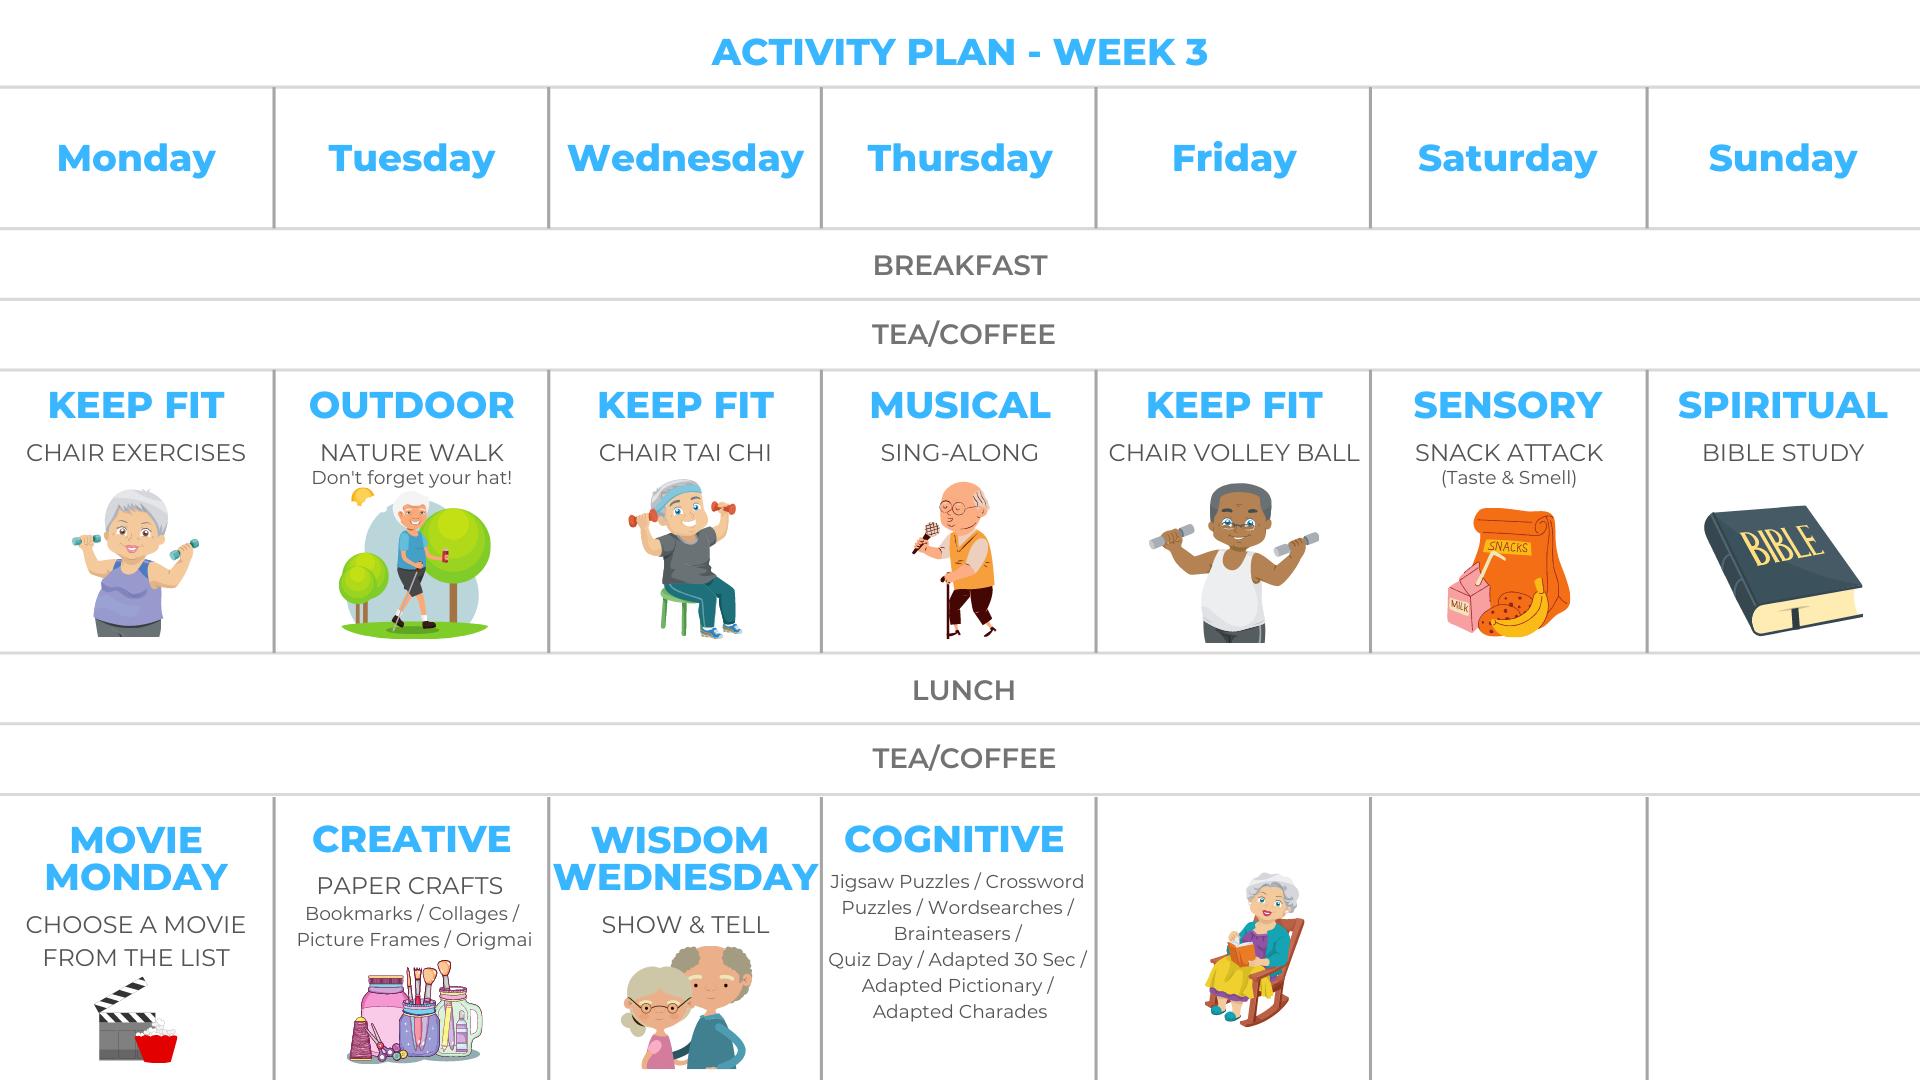 nazareth care activity plan